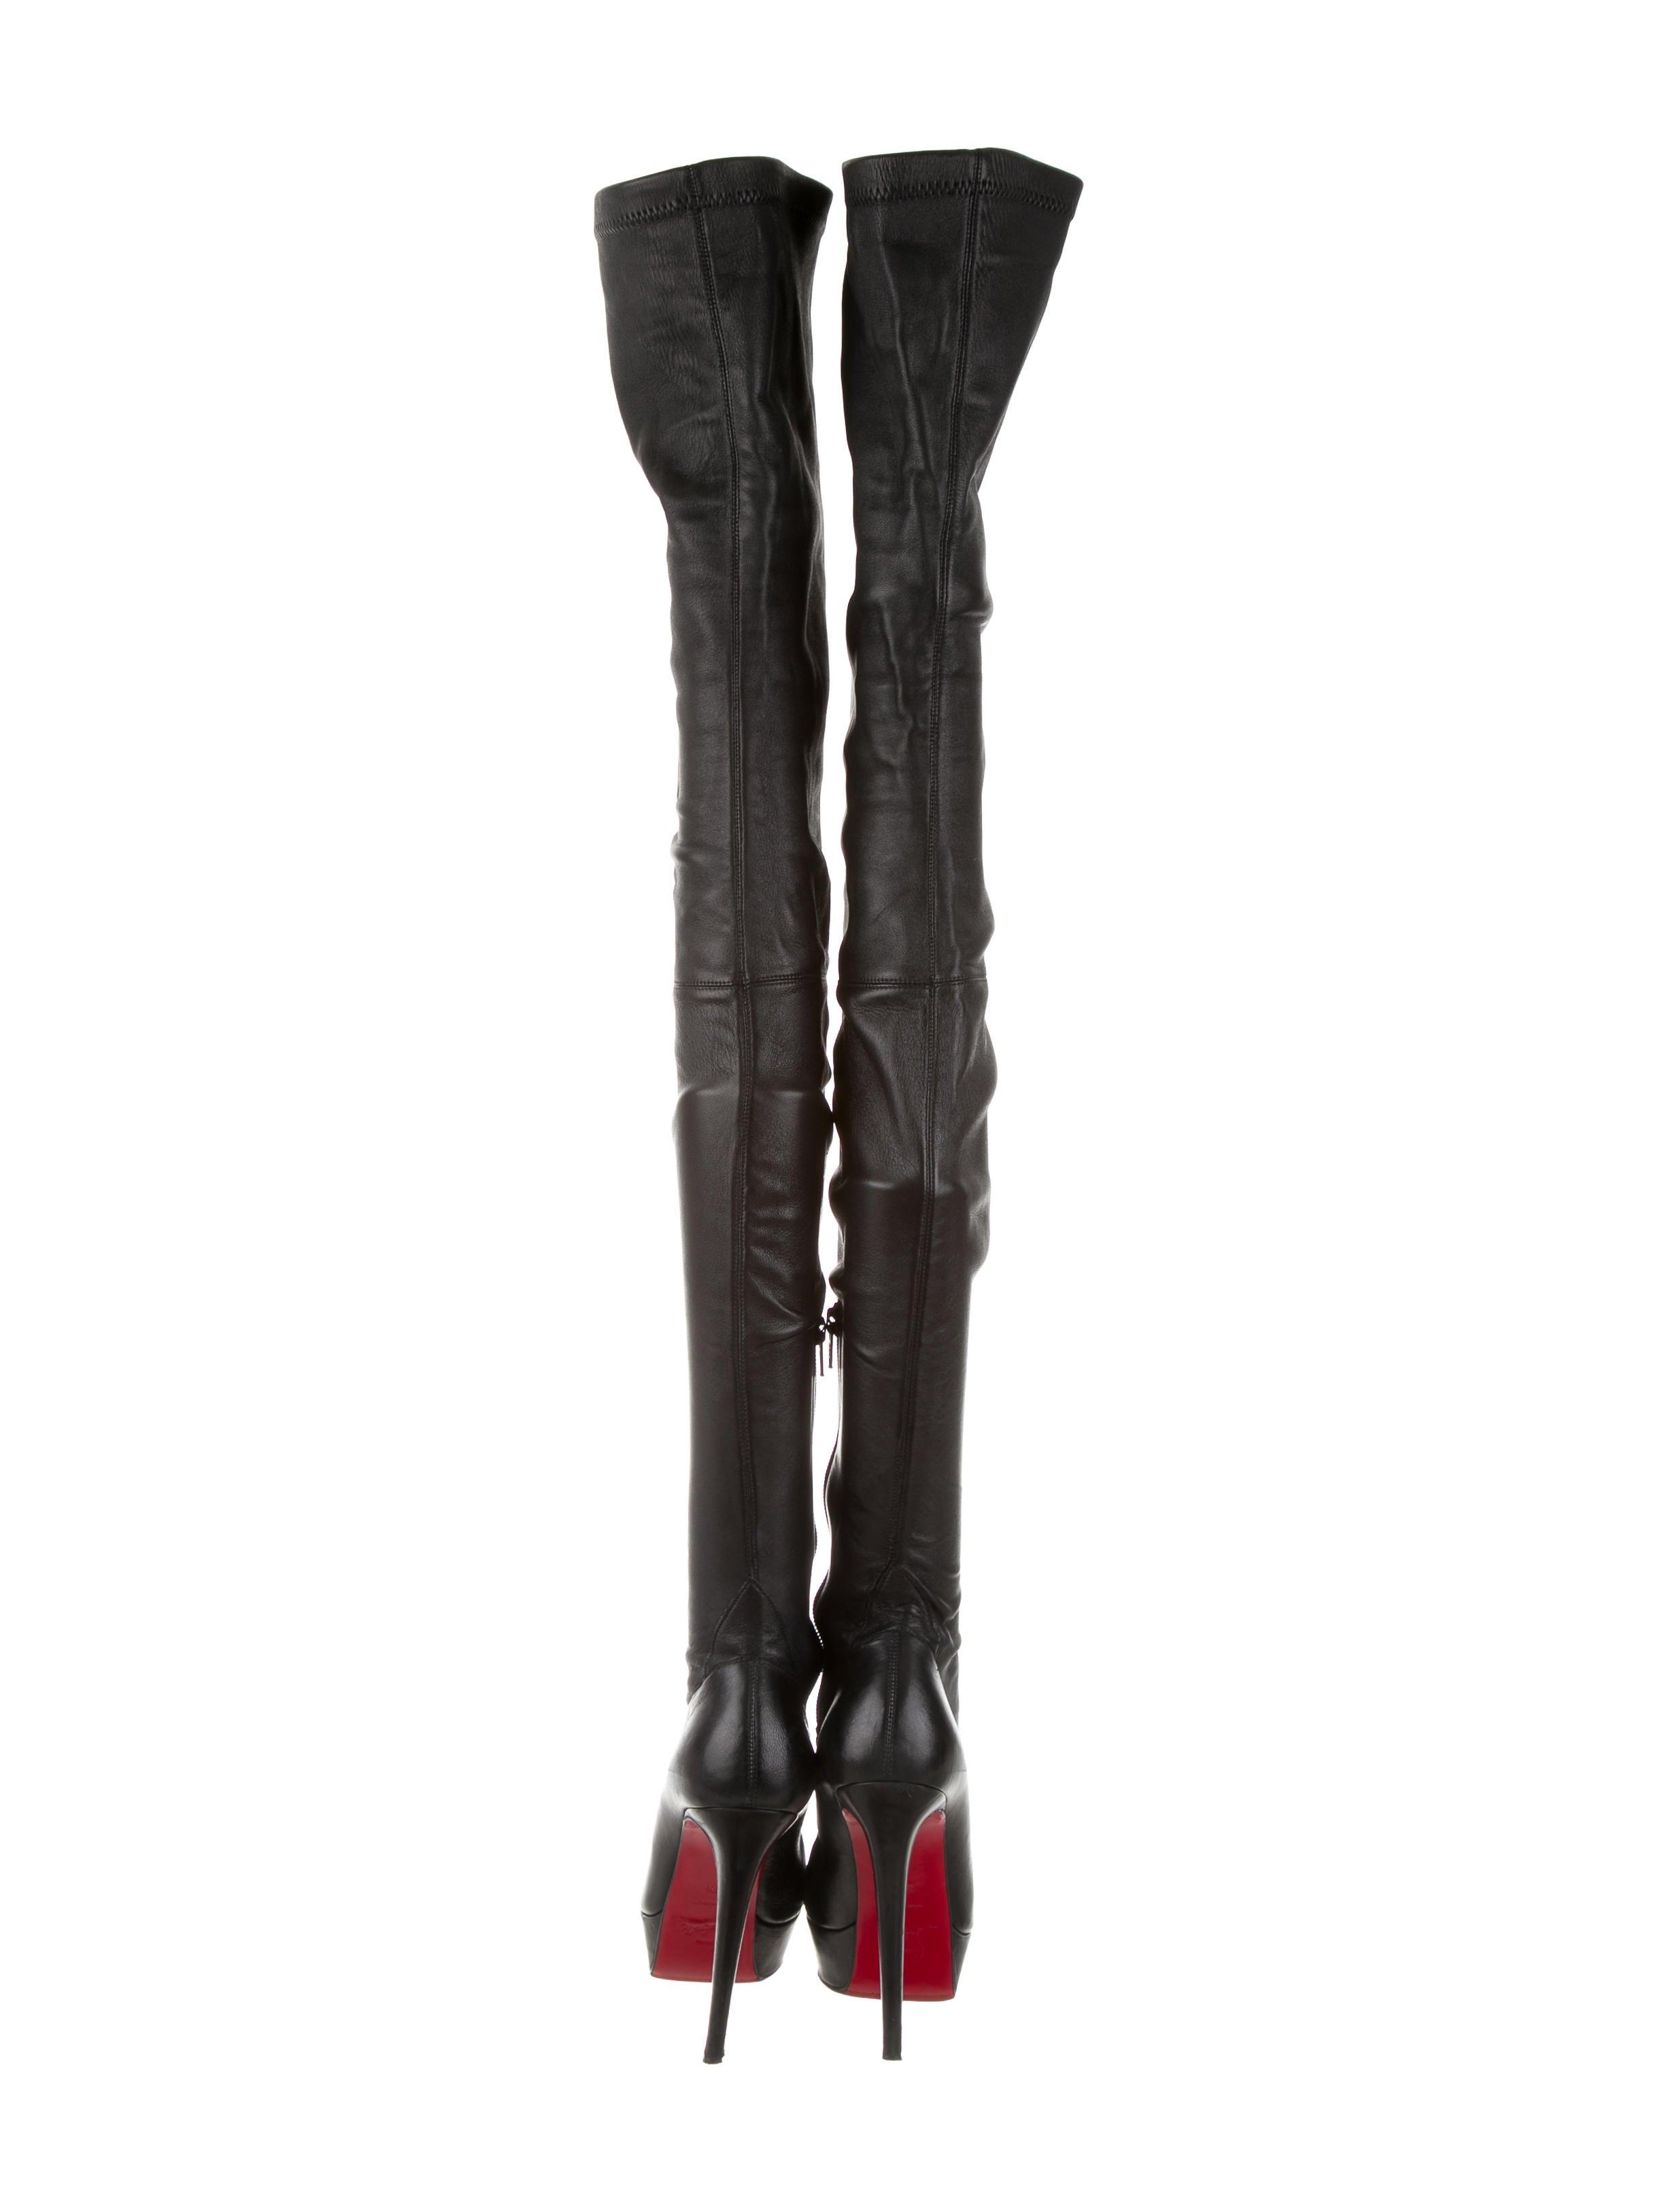 57fe568c8fed ... Christian Louboutin Gazolina Over the Knee Boots - YouTube Gazolina 140  Thigh-High Boots ...